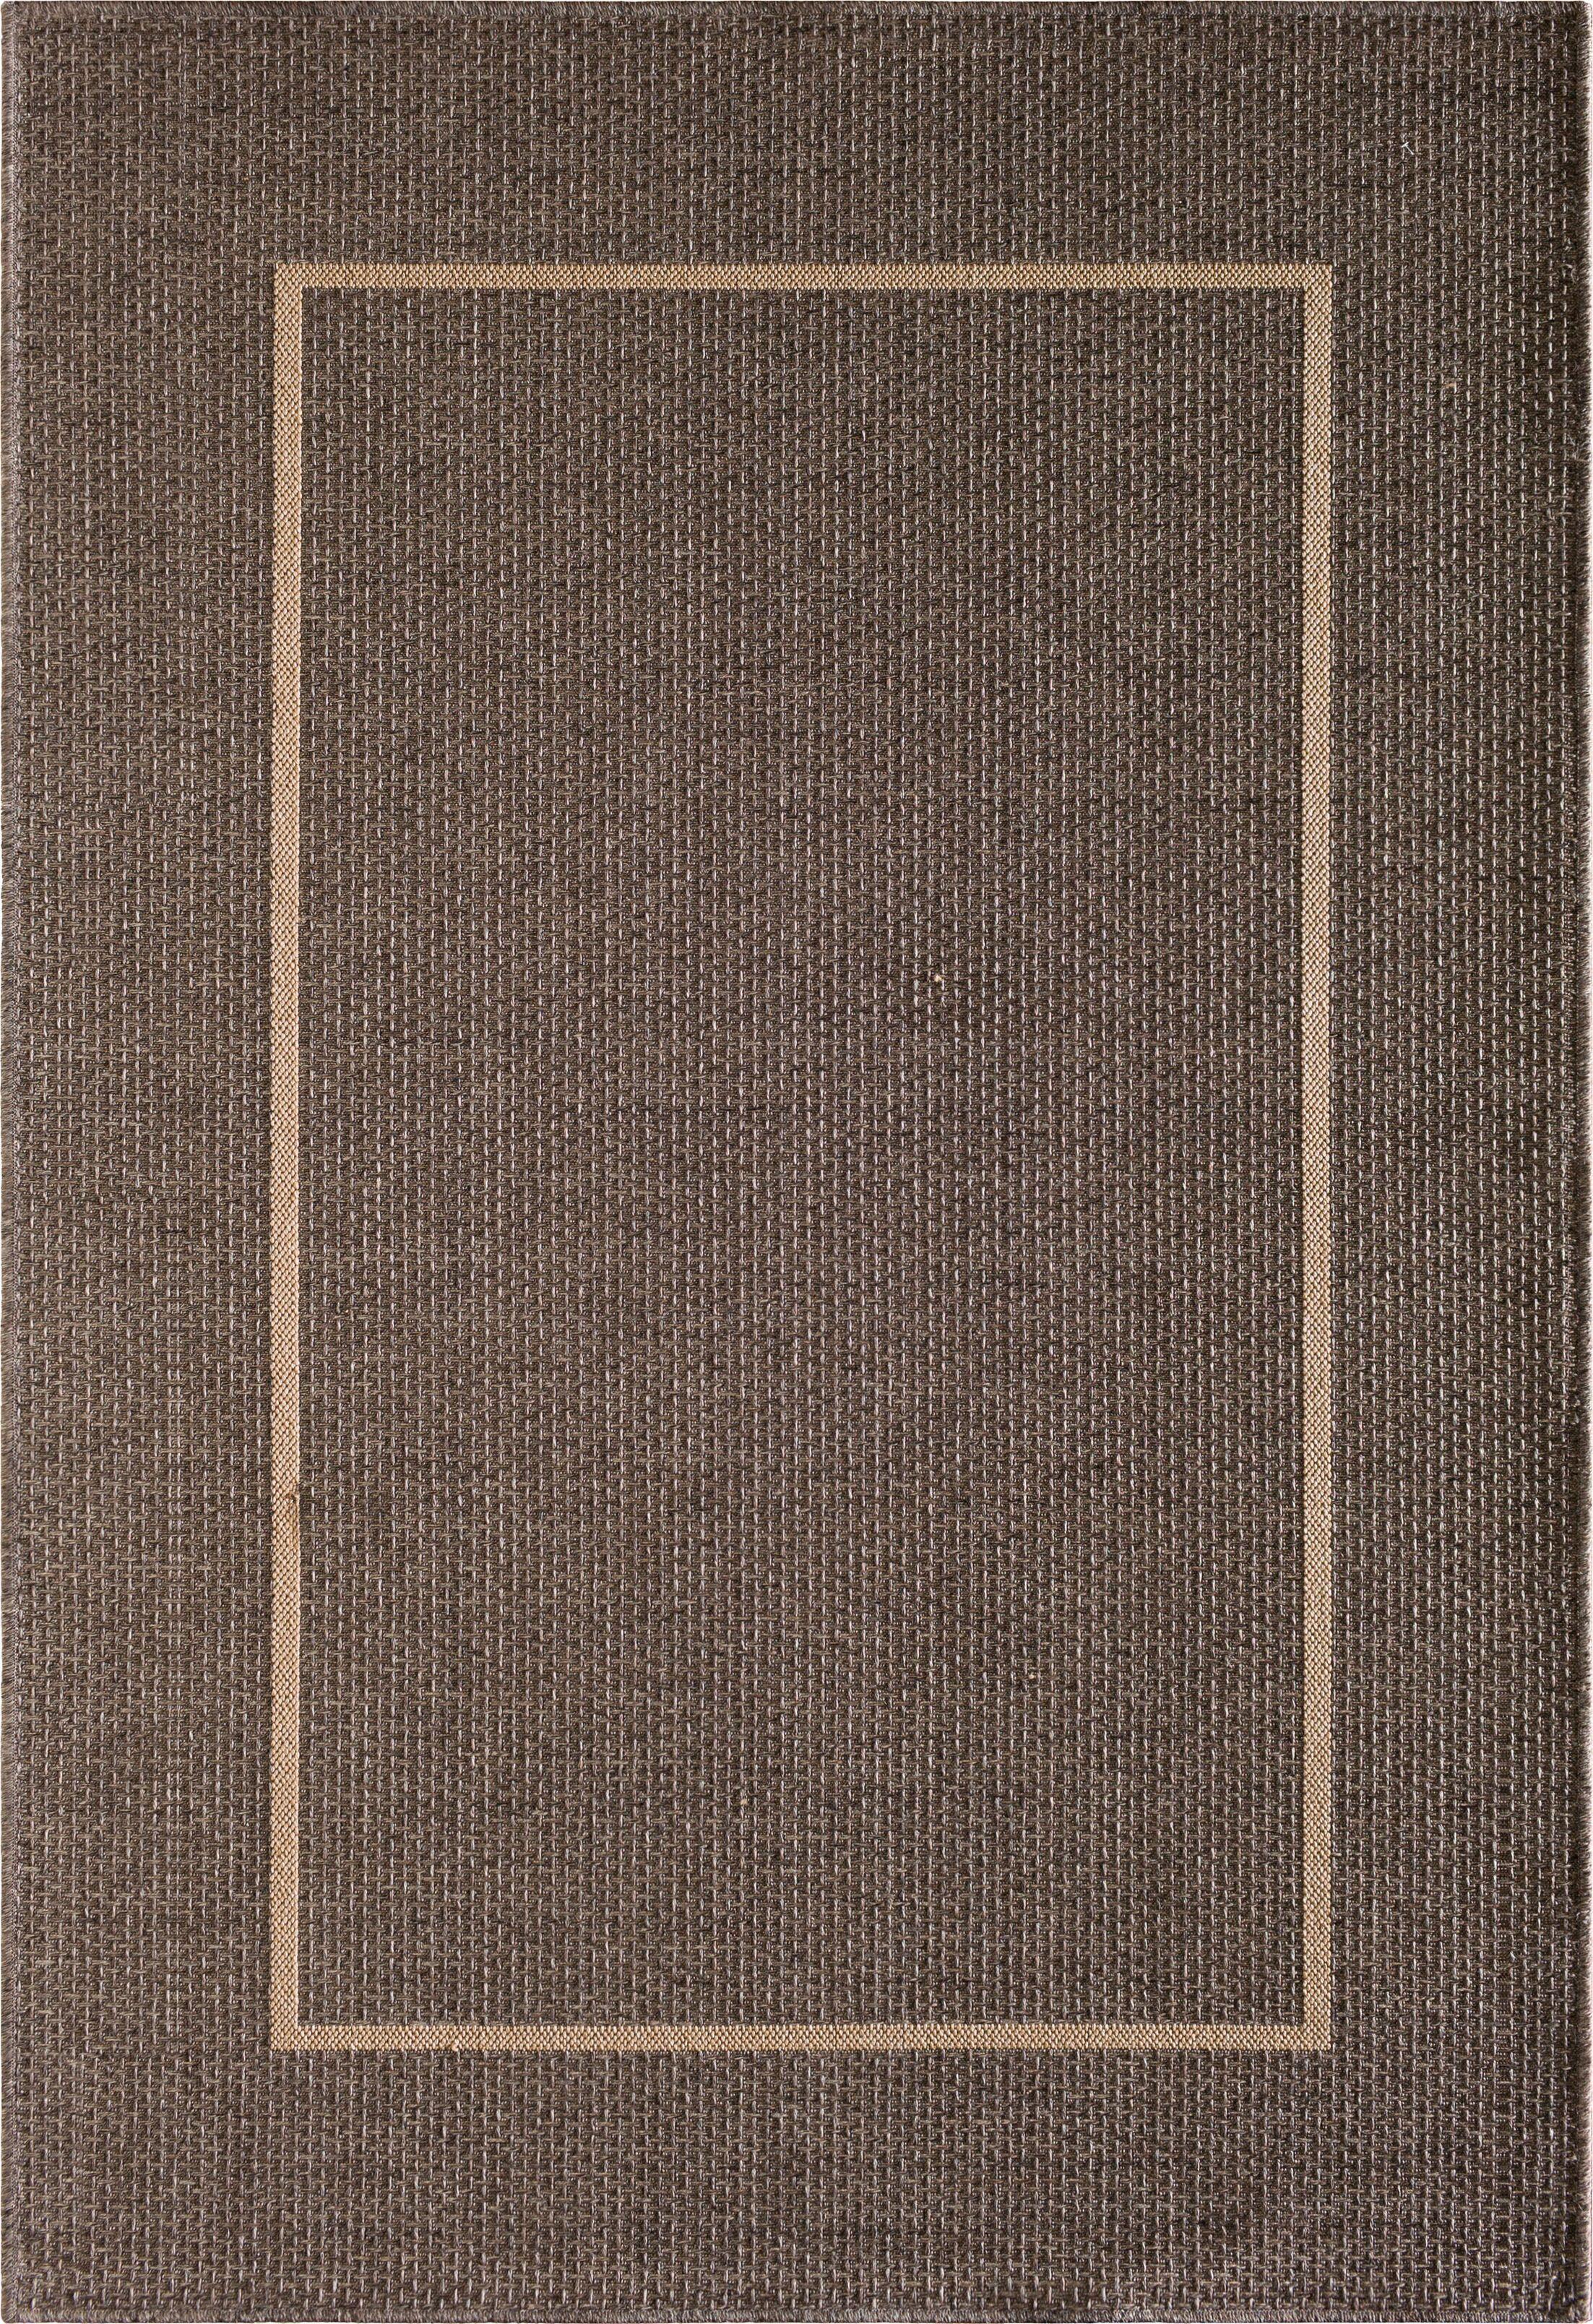 Annica Gray Indoor/Outdoor Area Rug Rug Size: 8'8